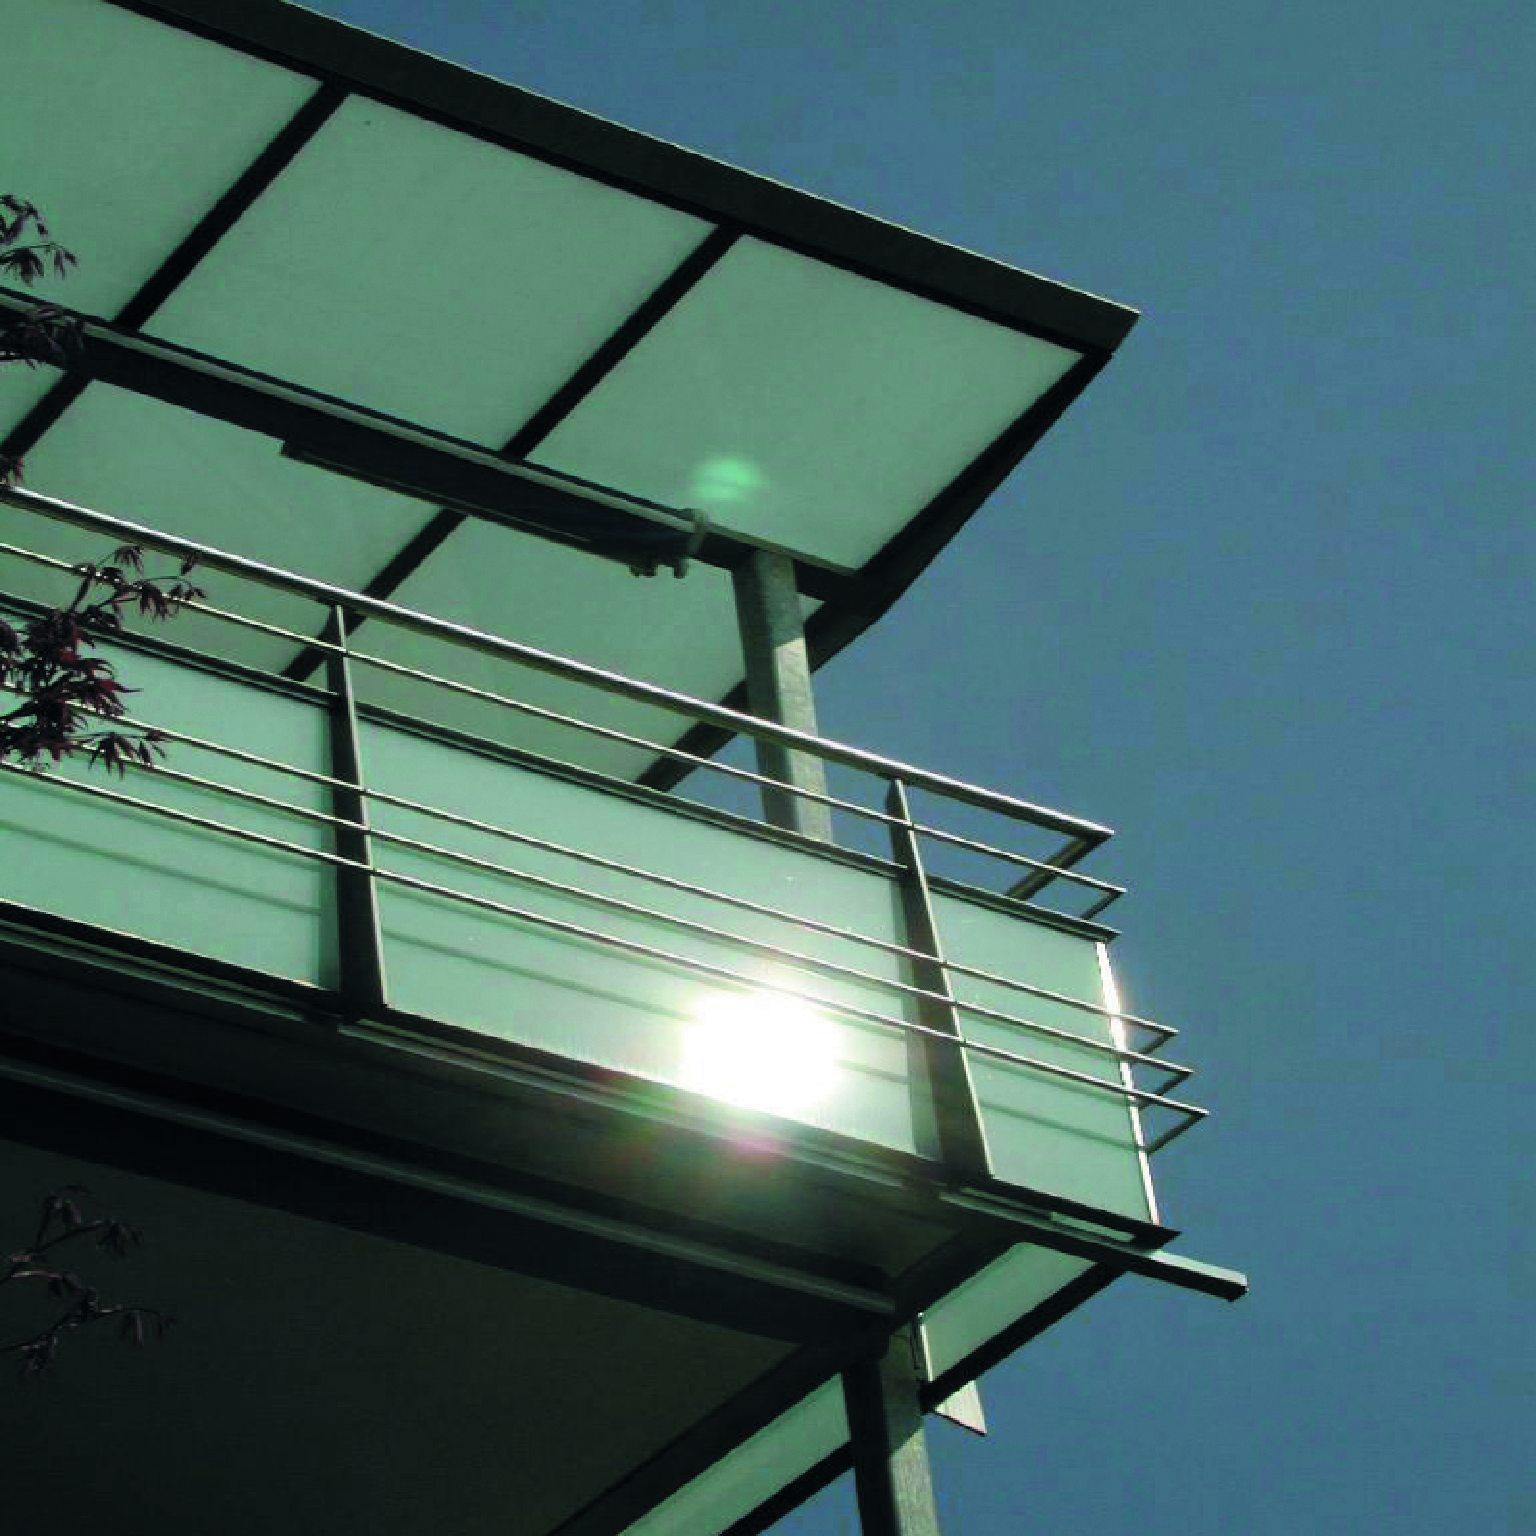 Balkontürme  Balkongeländer